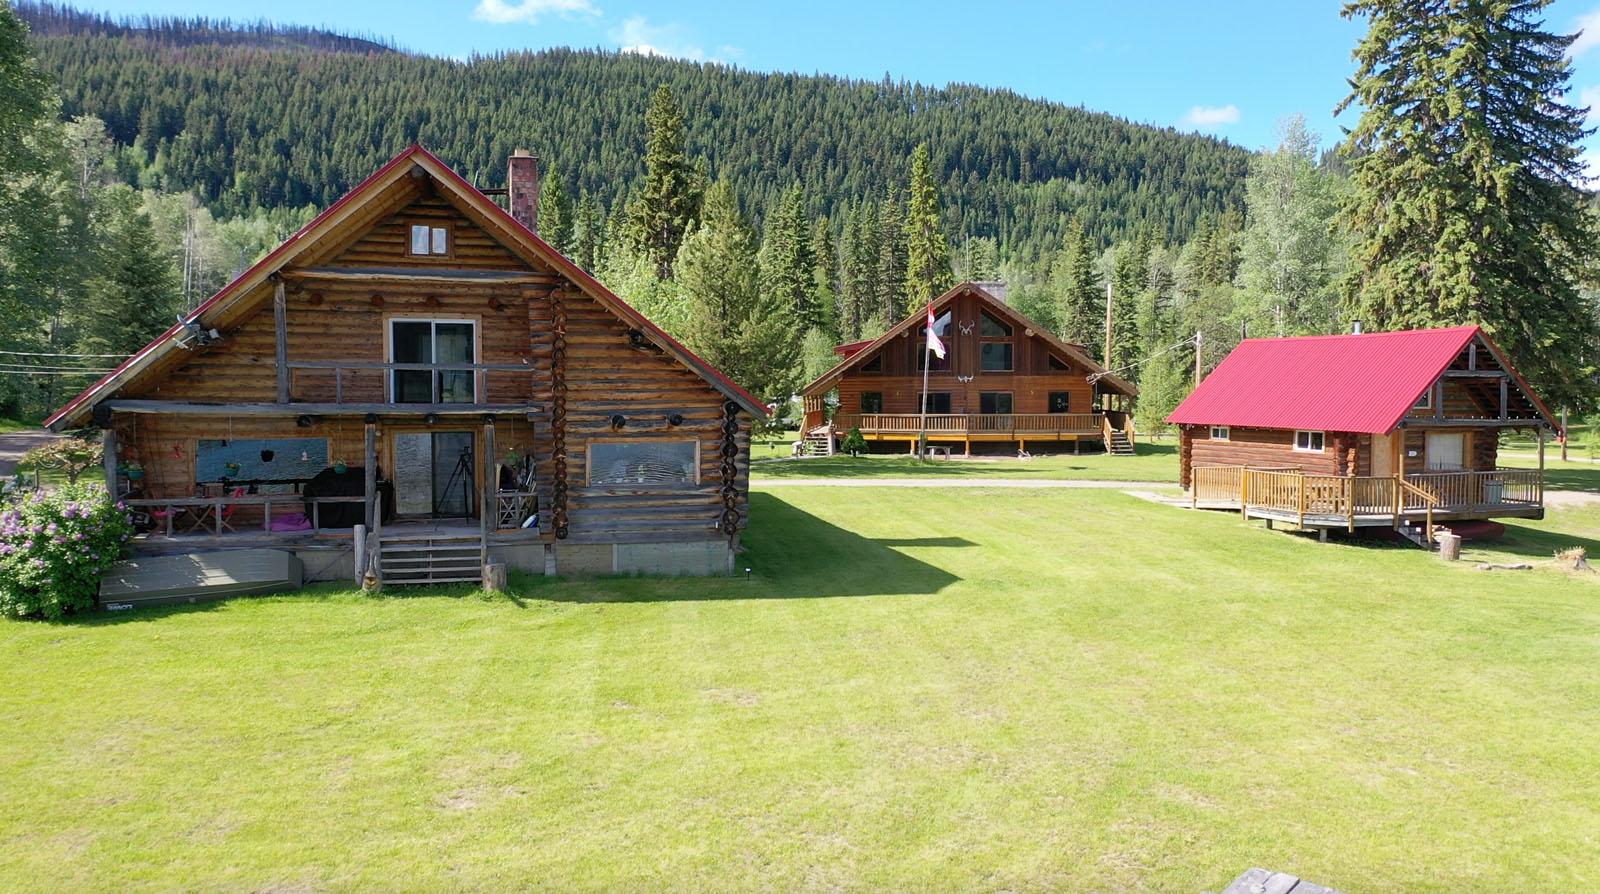 Canim lake resort 23